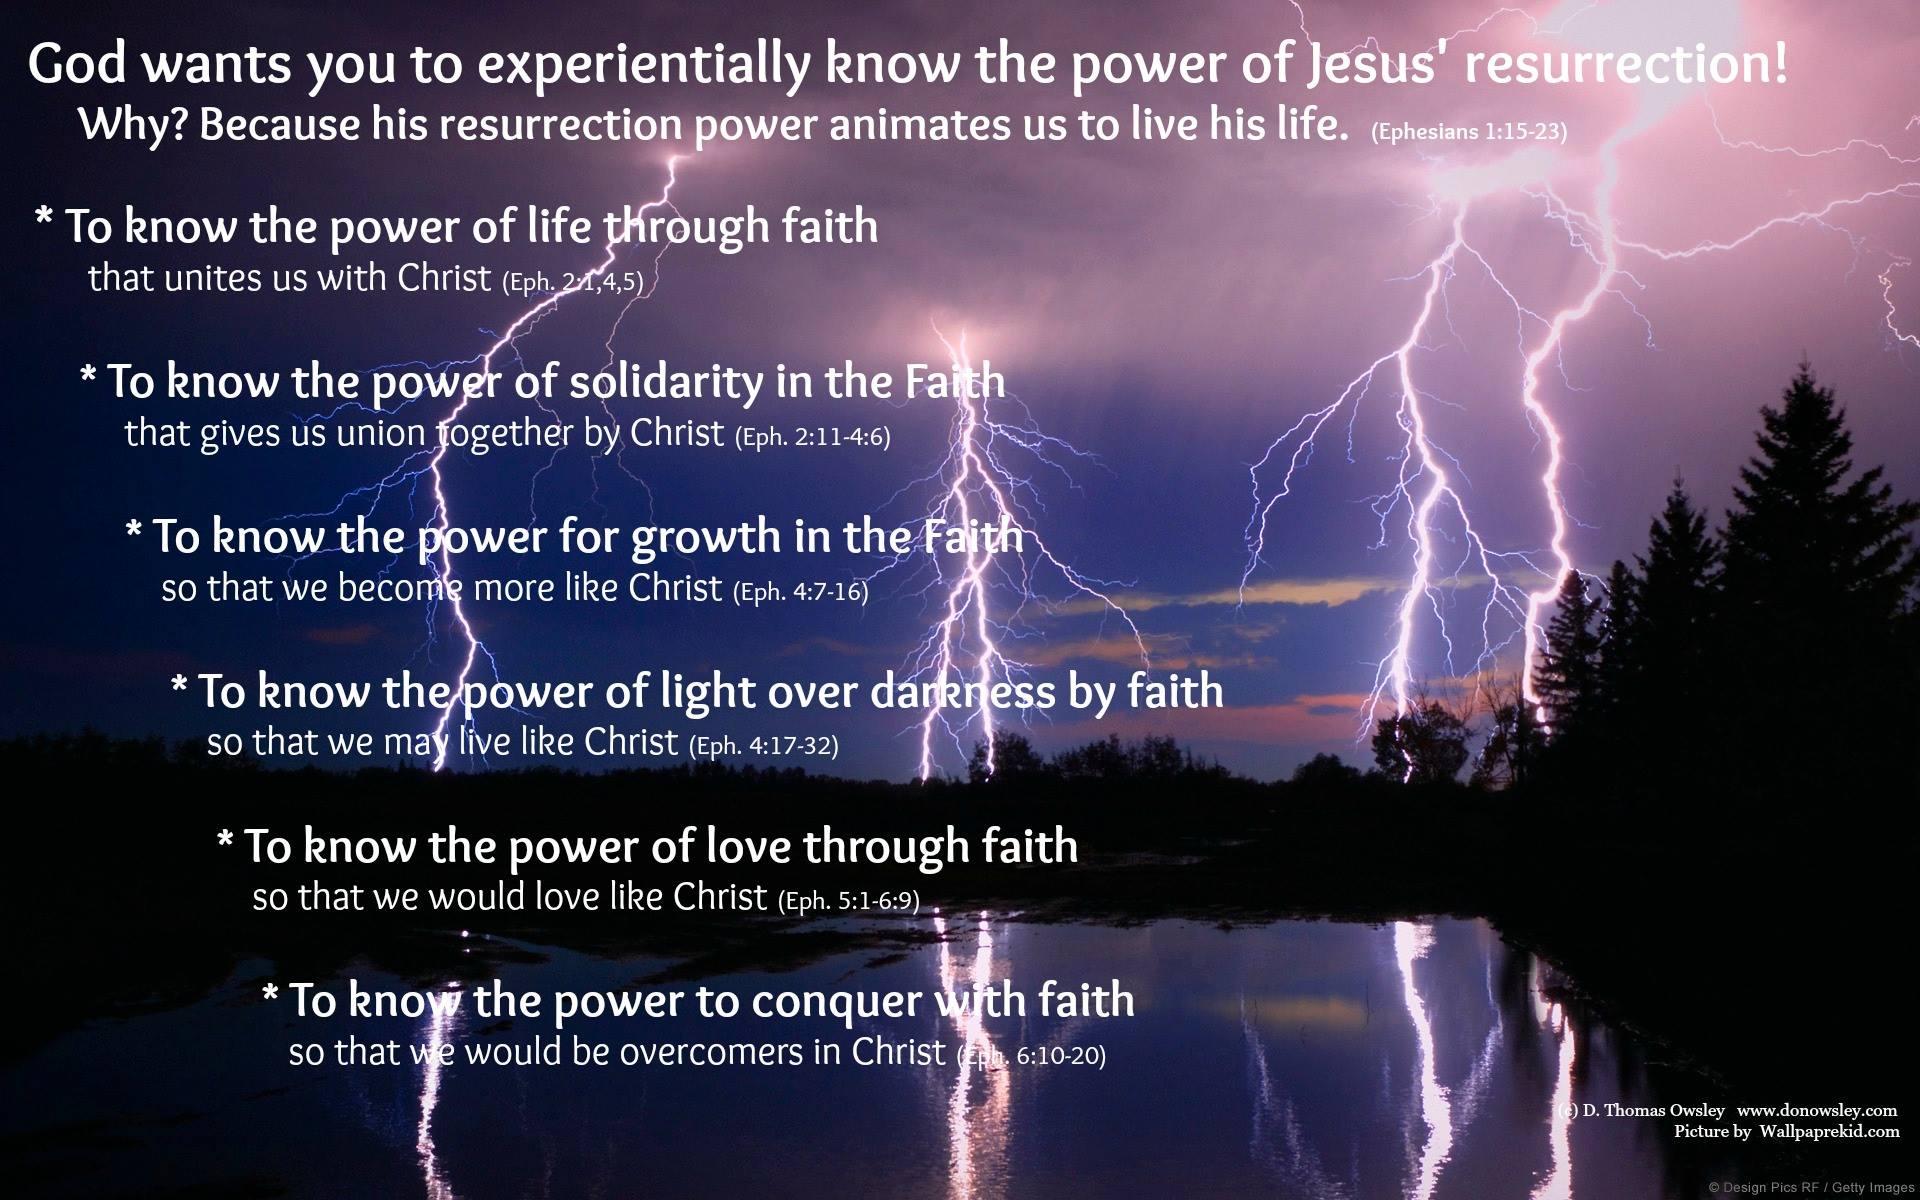 The power of Jesus' resurrection.jpg